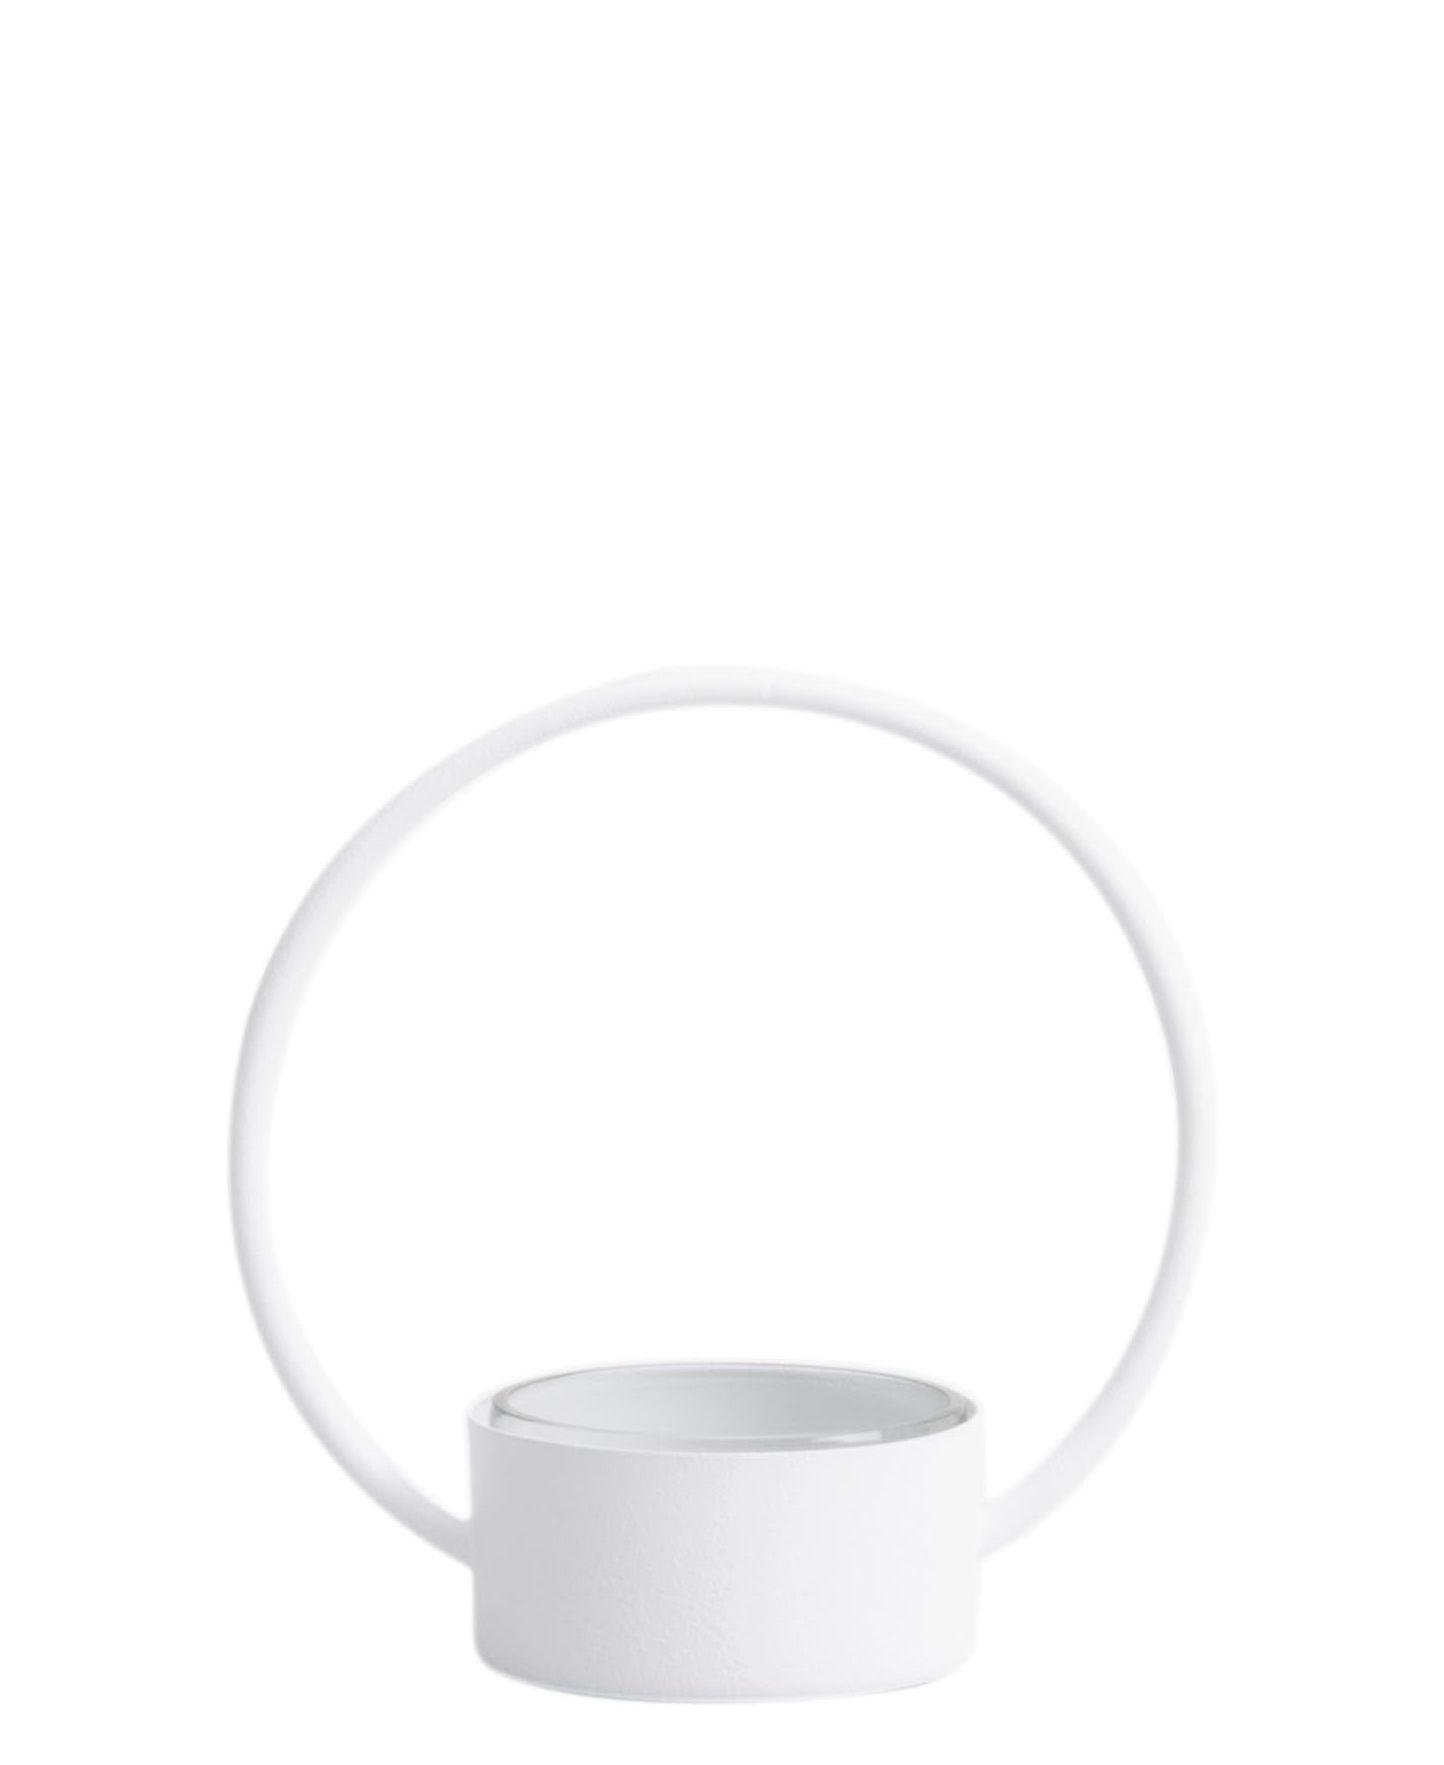 Arts de la table - Corbeilles, centres de table - Corbeille O Small / Corbeille - Ø 16 x H 16 cm - XL Boom - Blanc - Acier  laqué, Verre